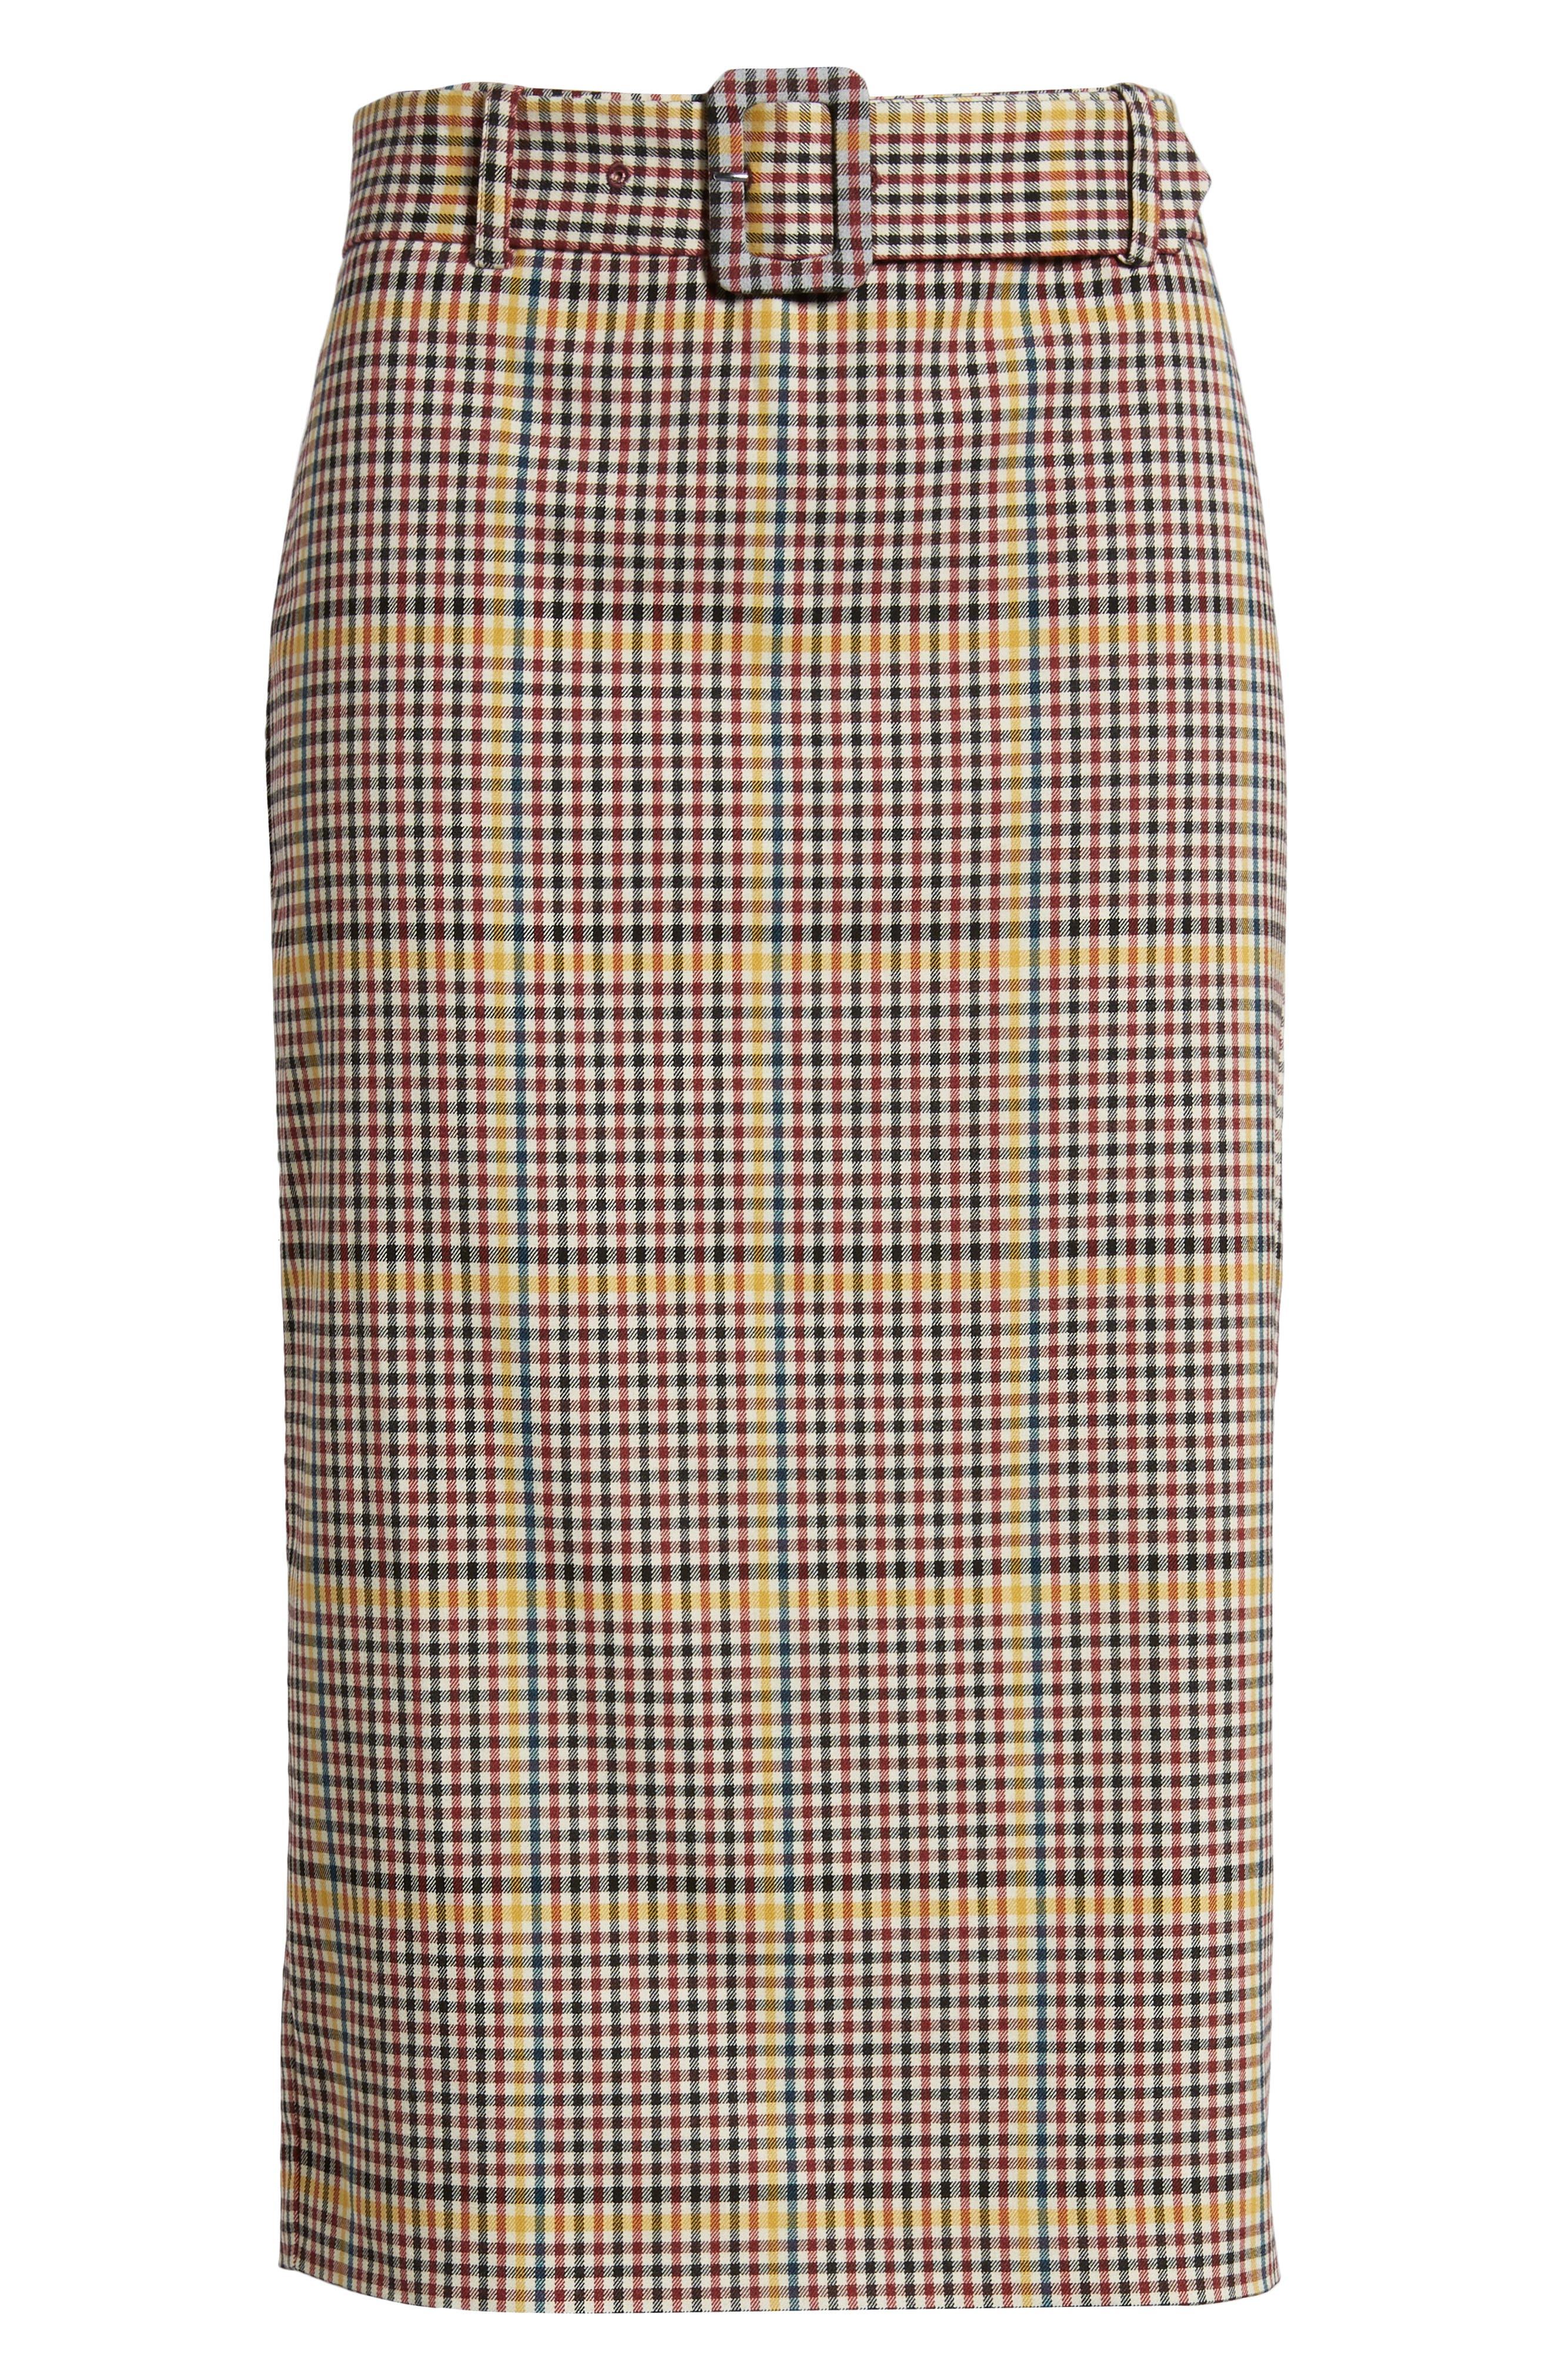 Plaid Pencil Skirt,                             Alternate thumbnail 6, color,                             601